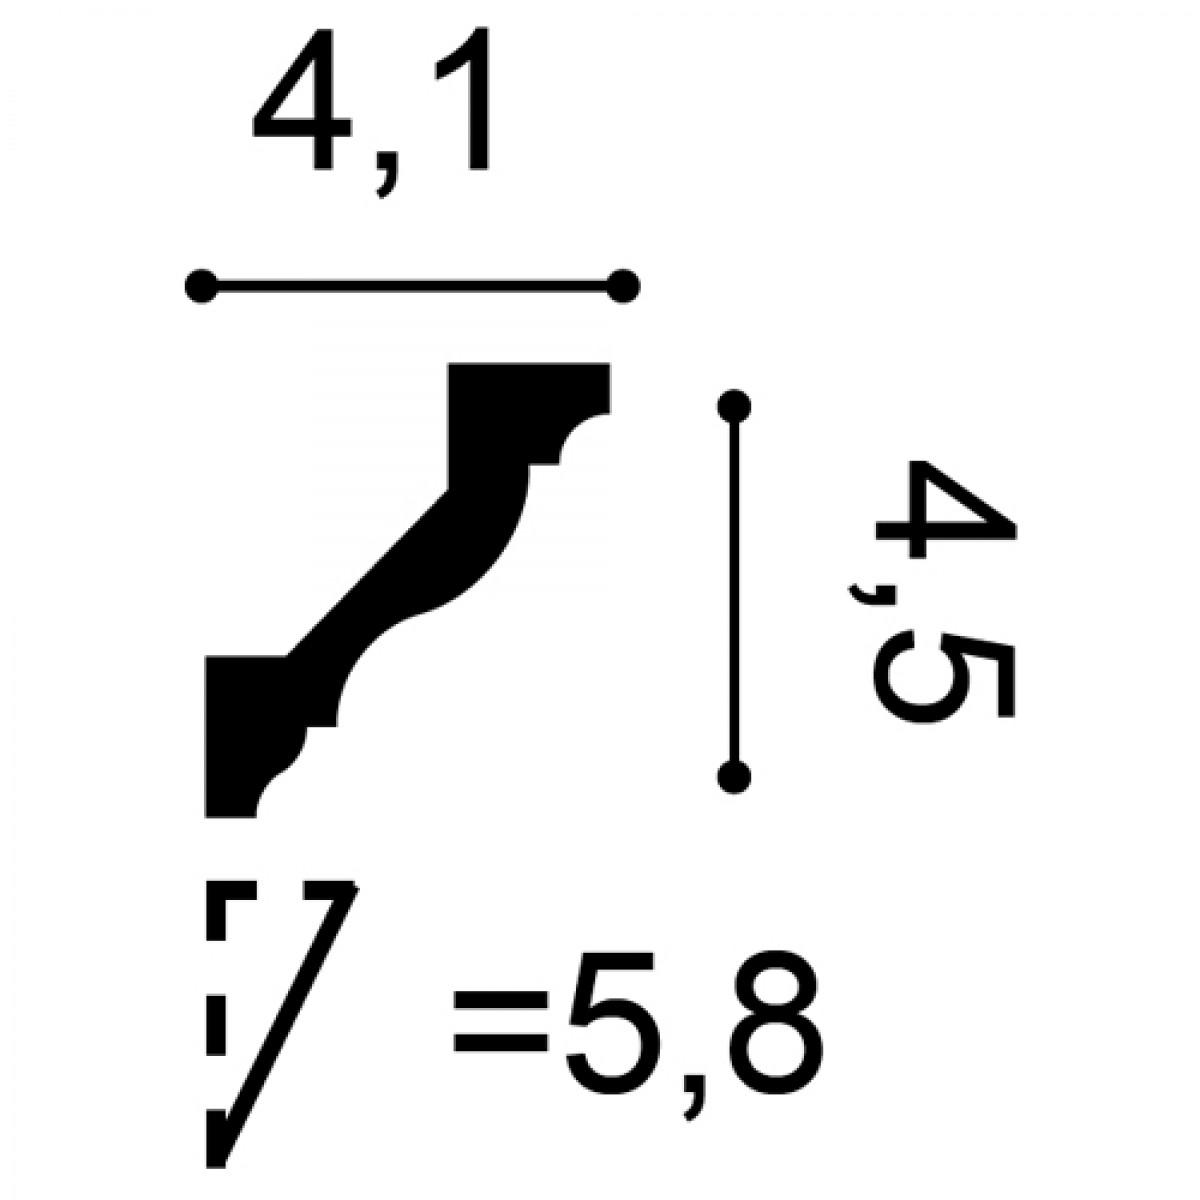 Cornisa Axxent CX110, Dimensiuni: 200 X 4.5 X 4.1 cm, Orac Decor